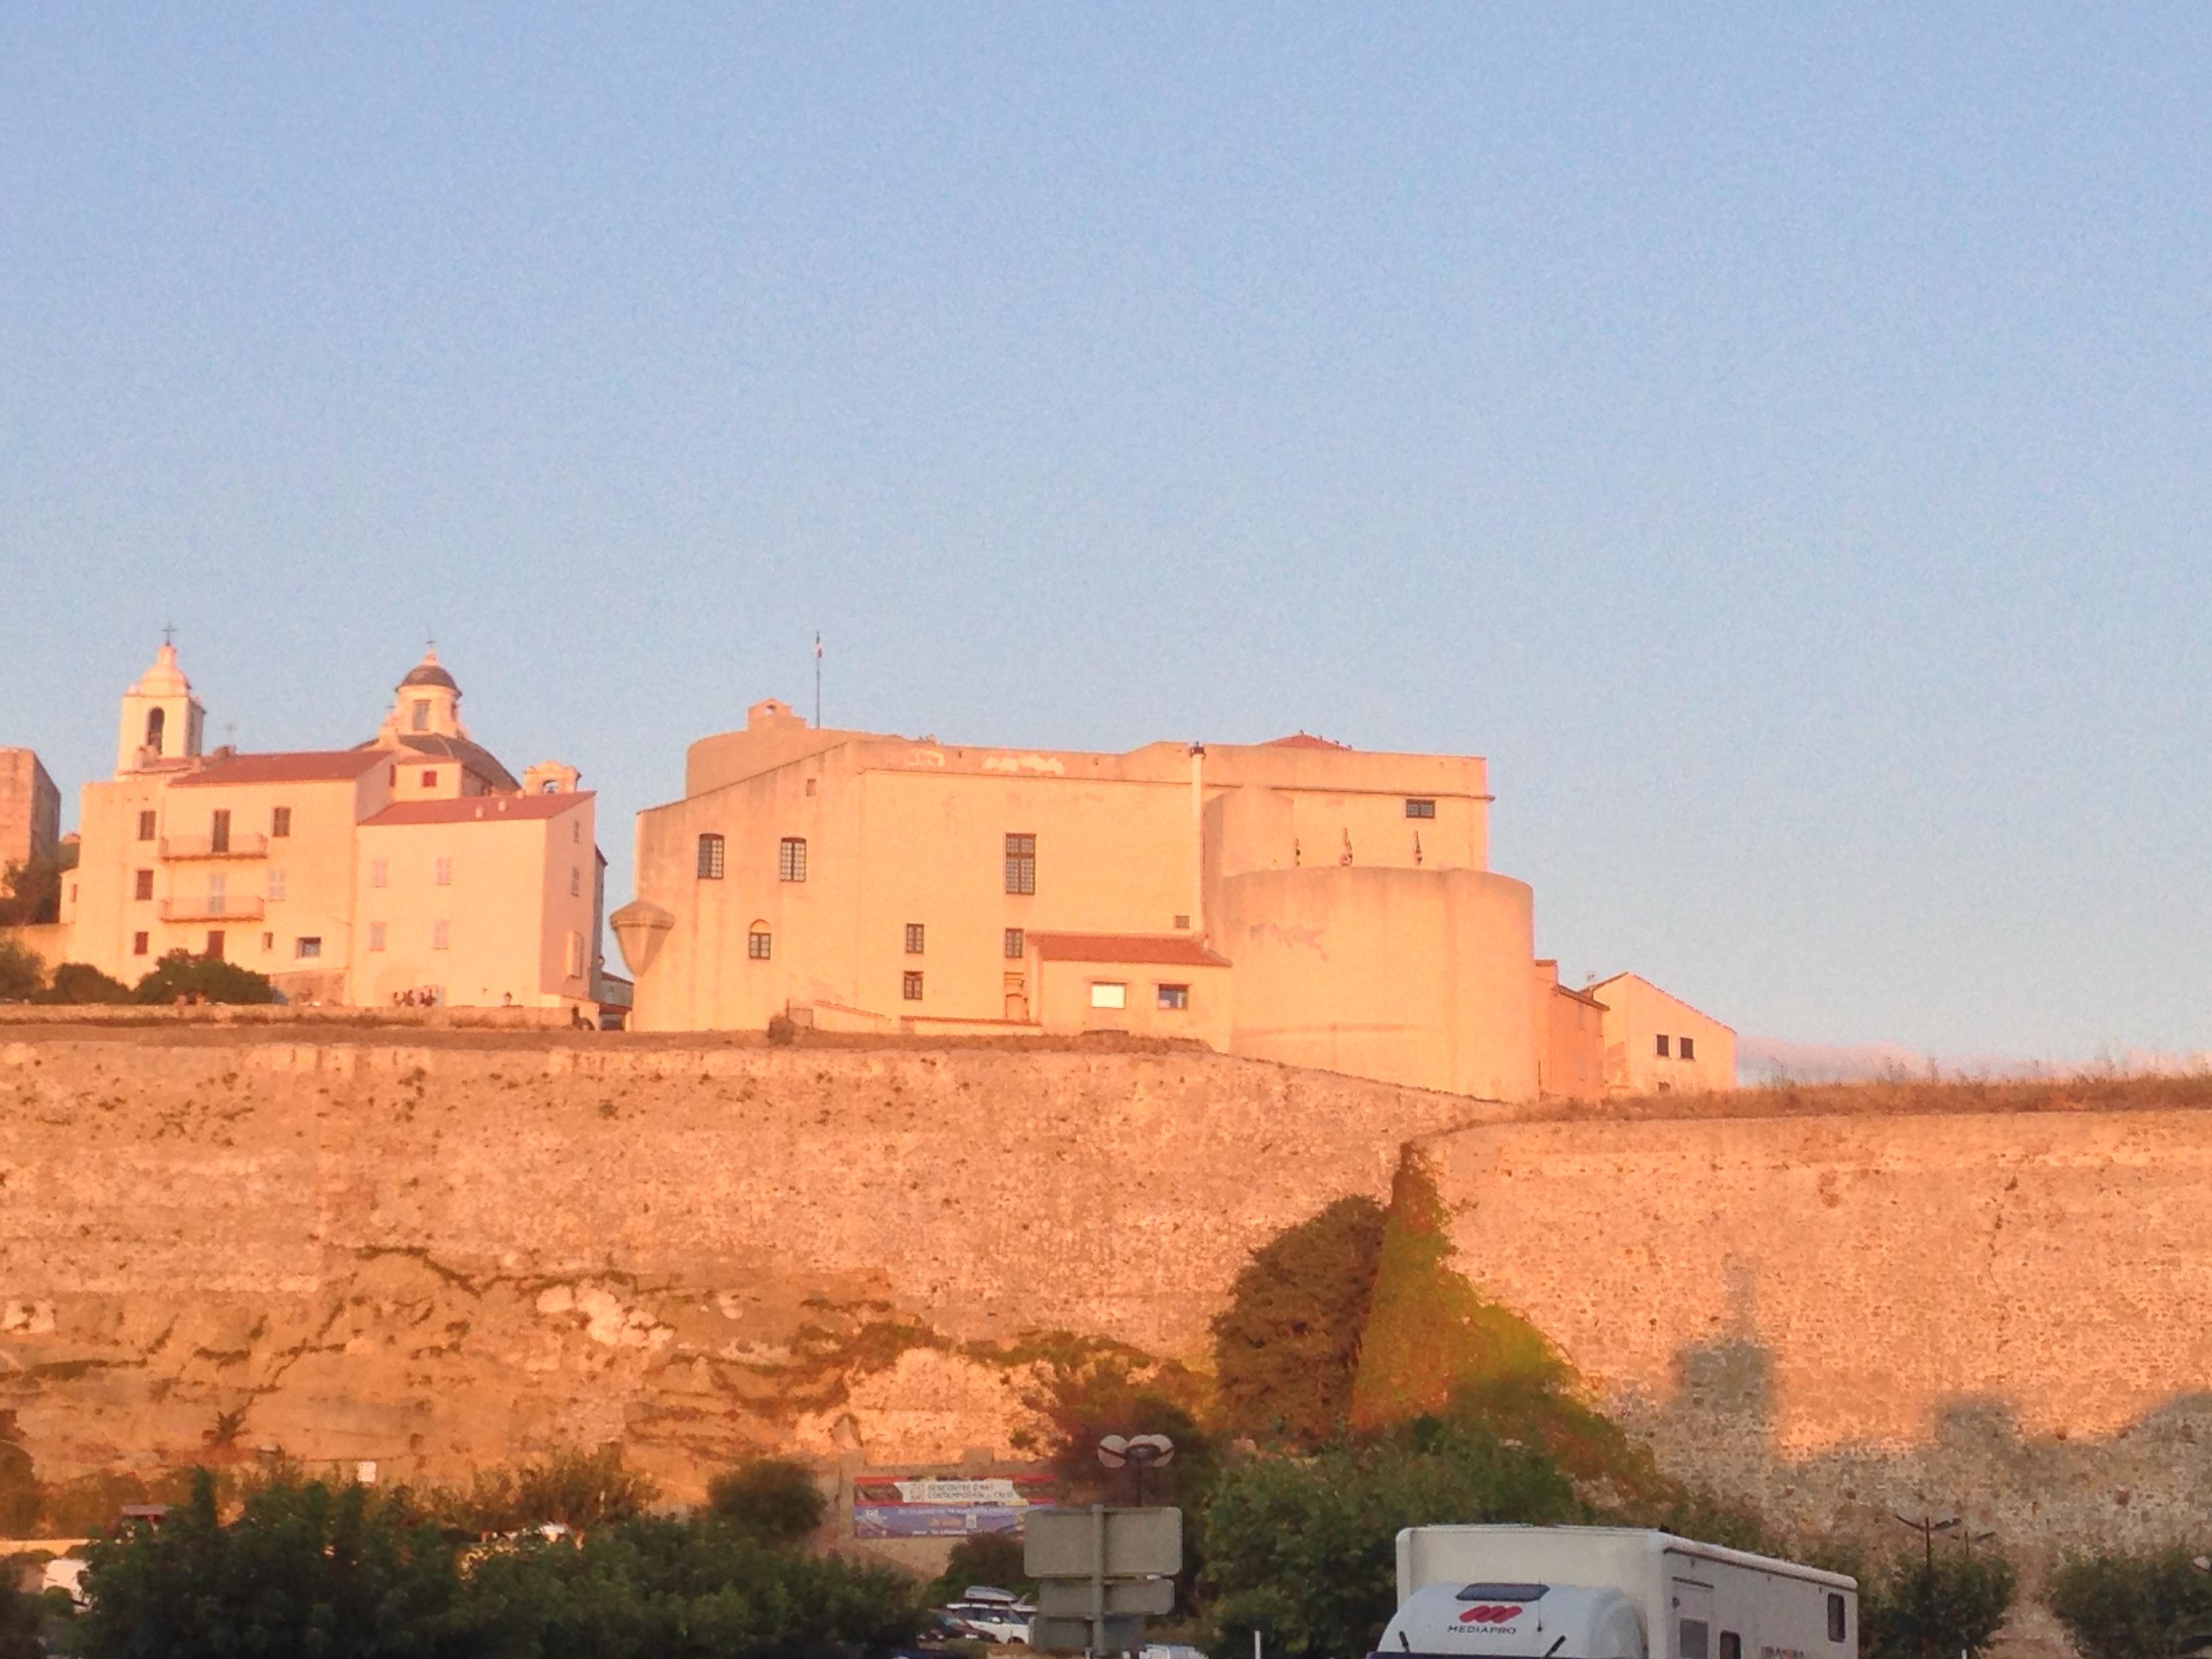 Corsica GR20 - Prologue - Port of Calvi